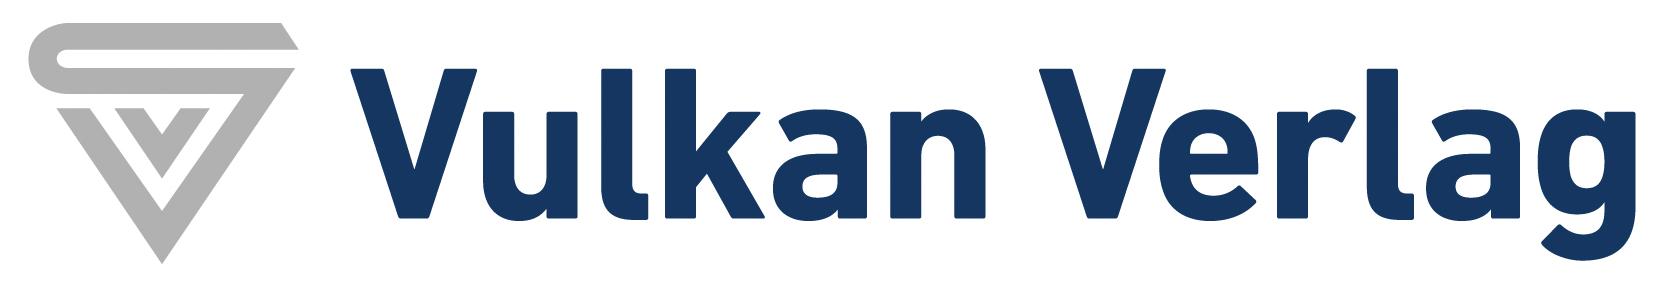 Vulkan Verlag